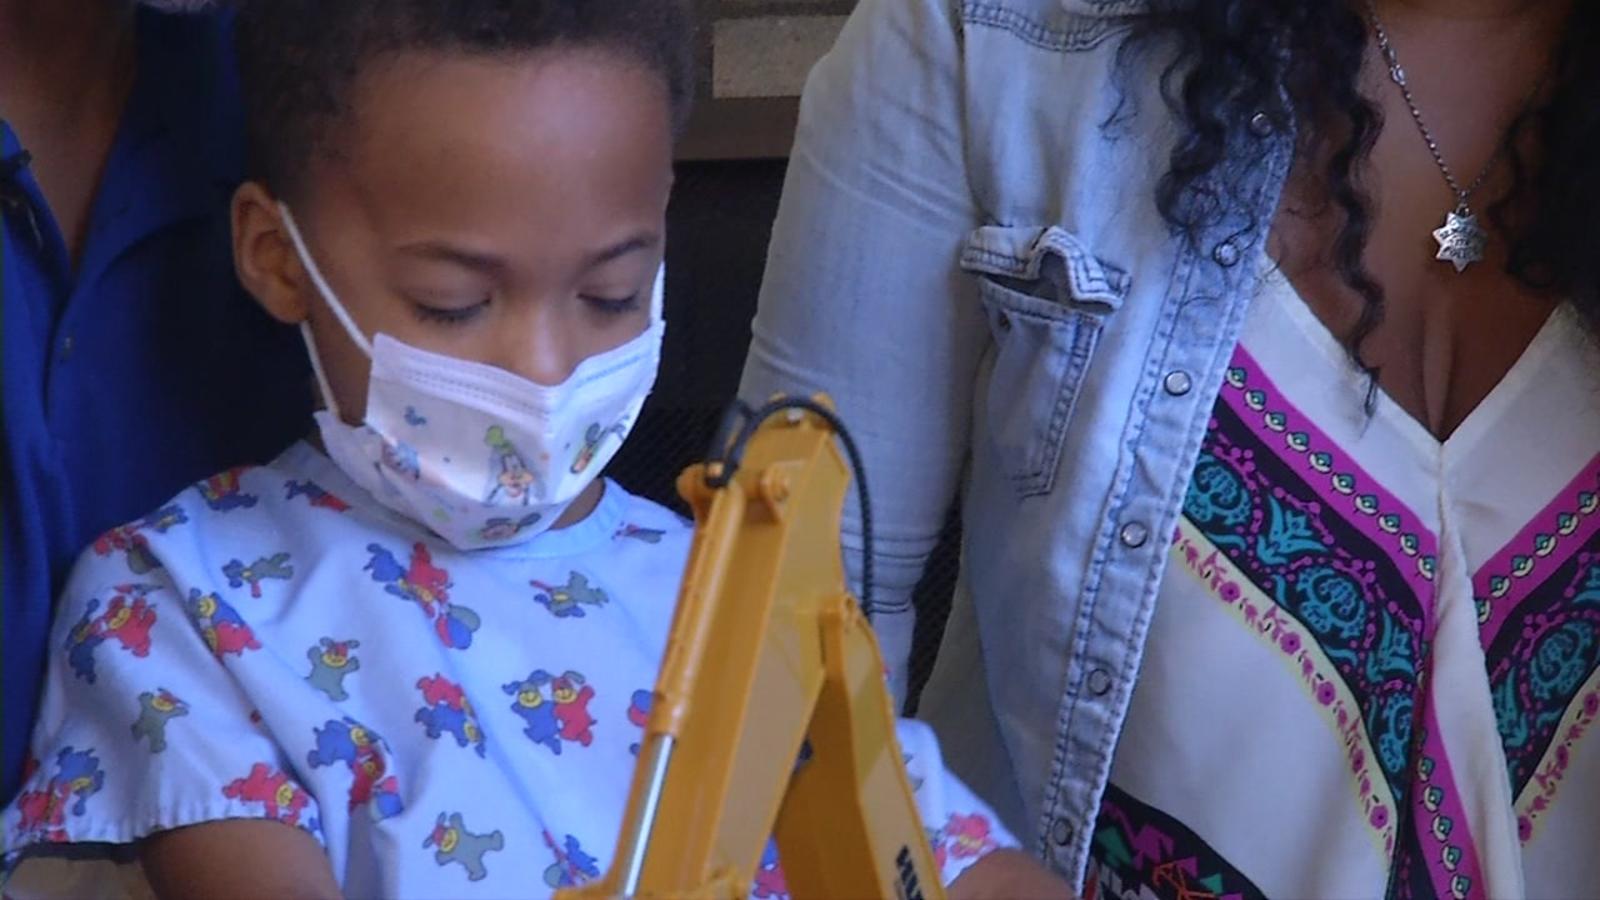 California boy, 5, needs bone marrow donor